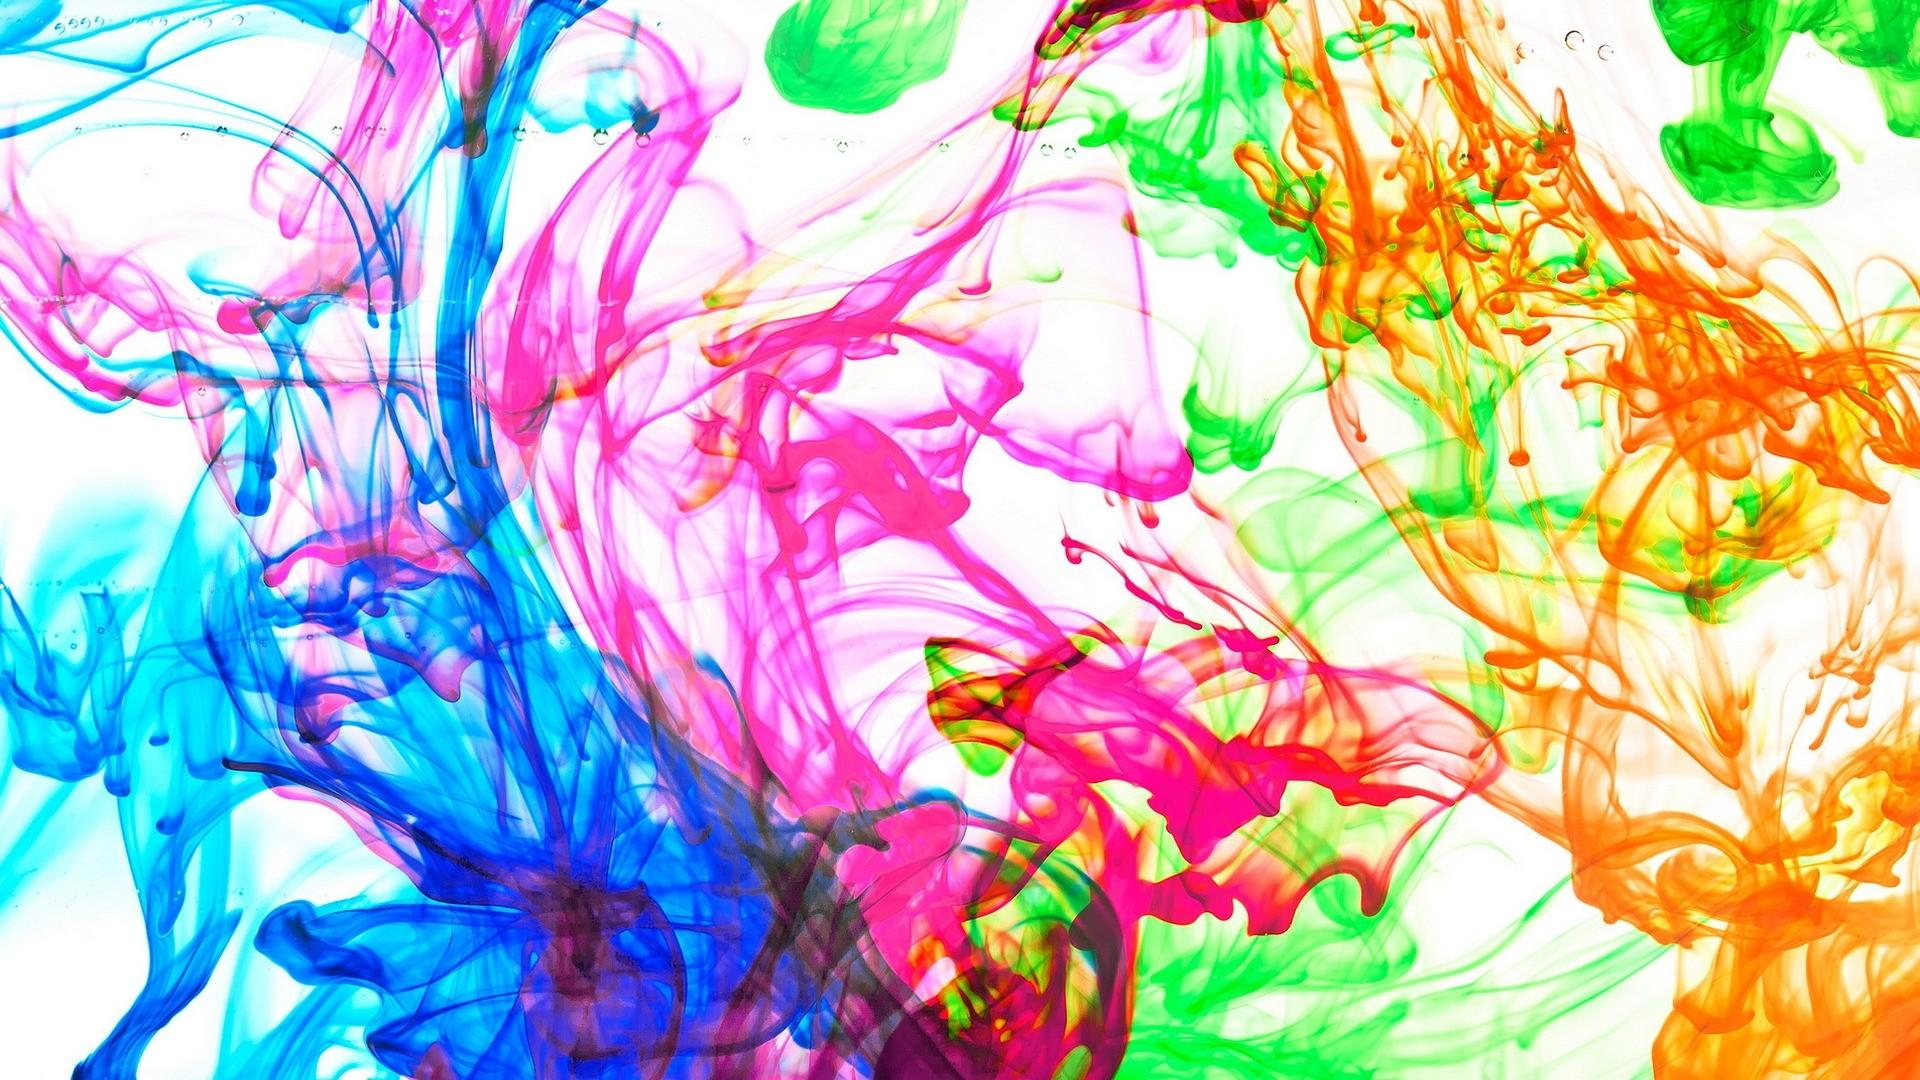 Paint Splash hd wallpaper download